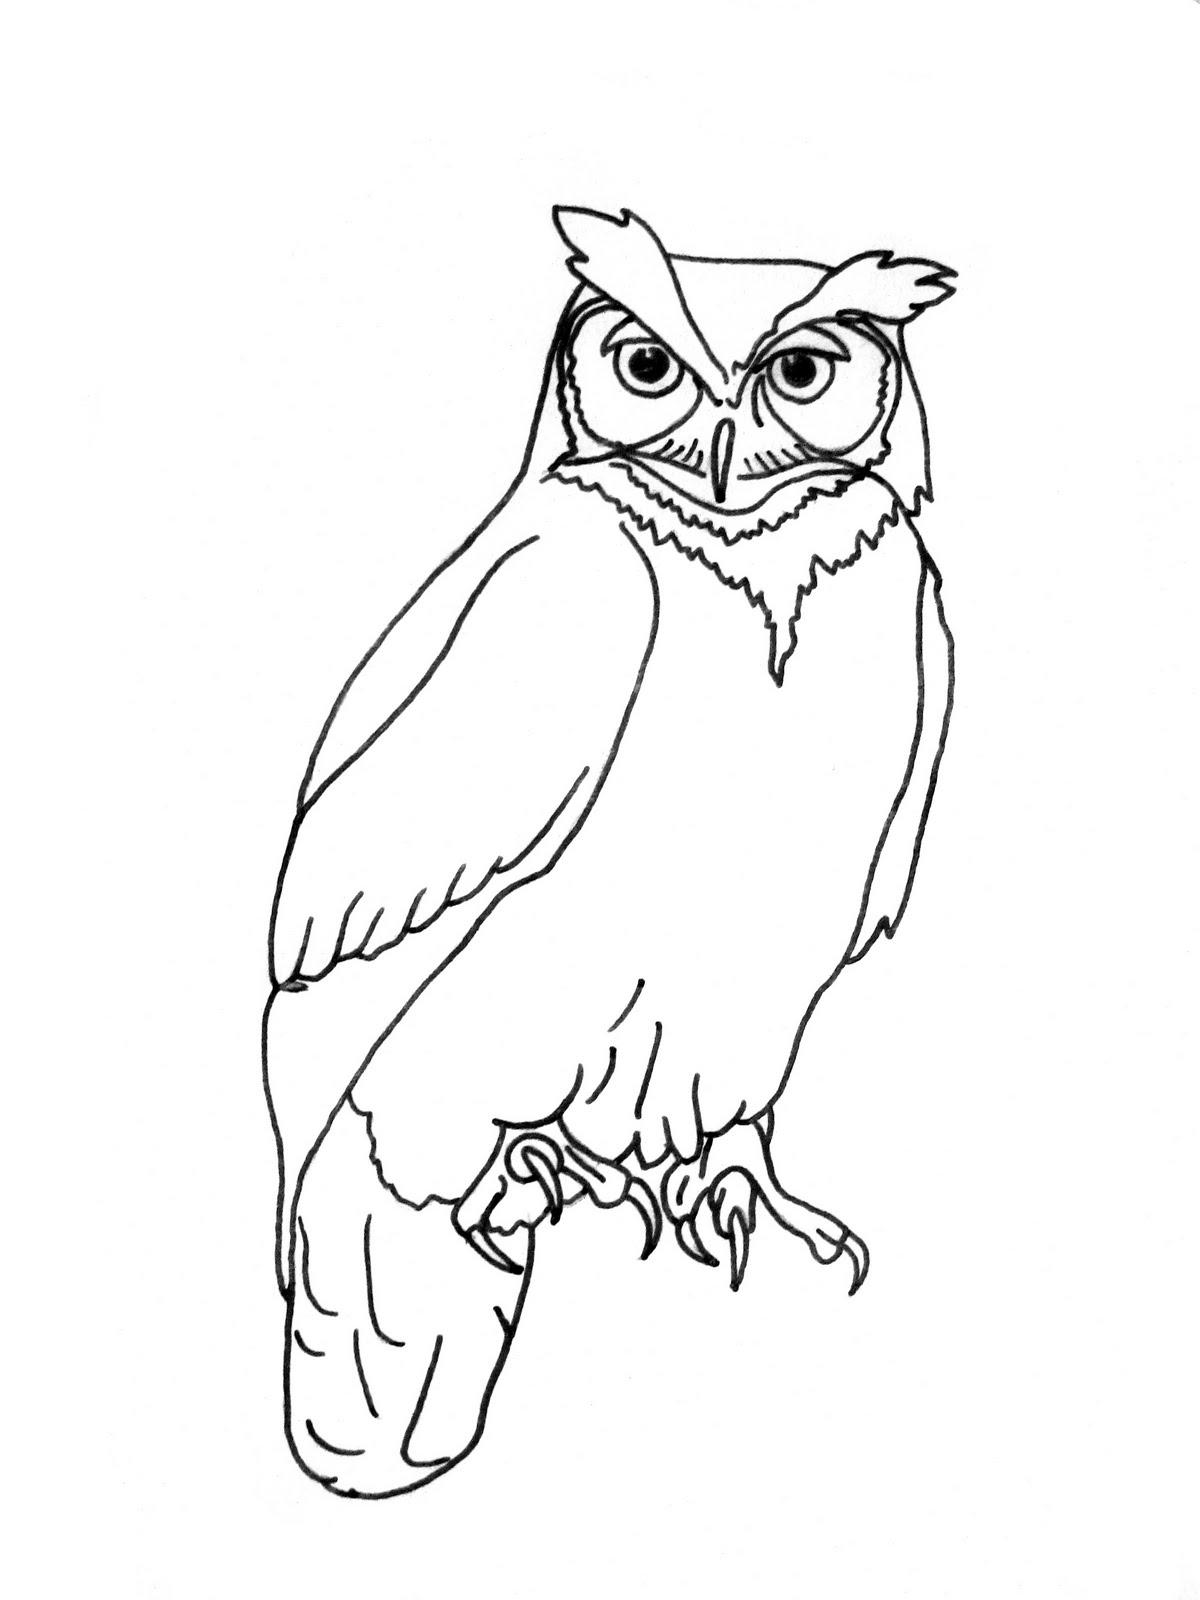 Simple Owl Drawing at GetDrawings | Free download (1200 x 1600 Pixel)